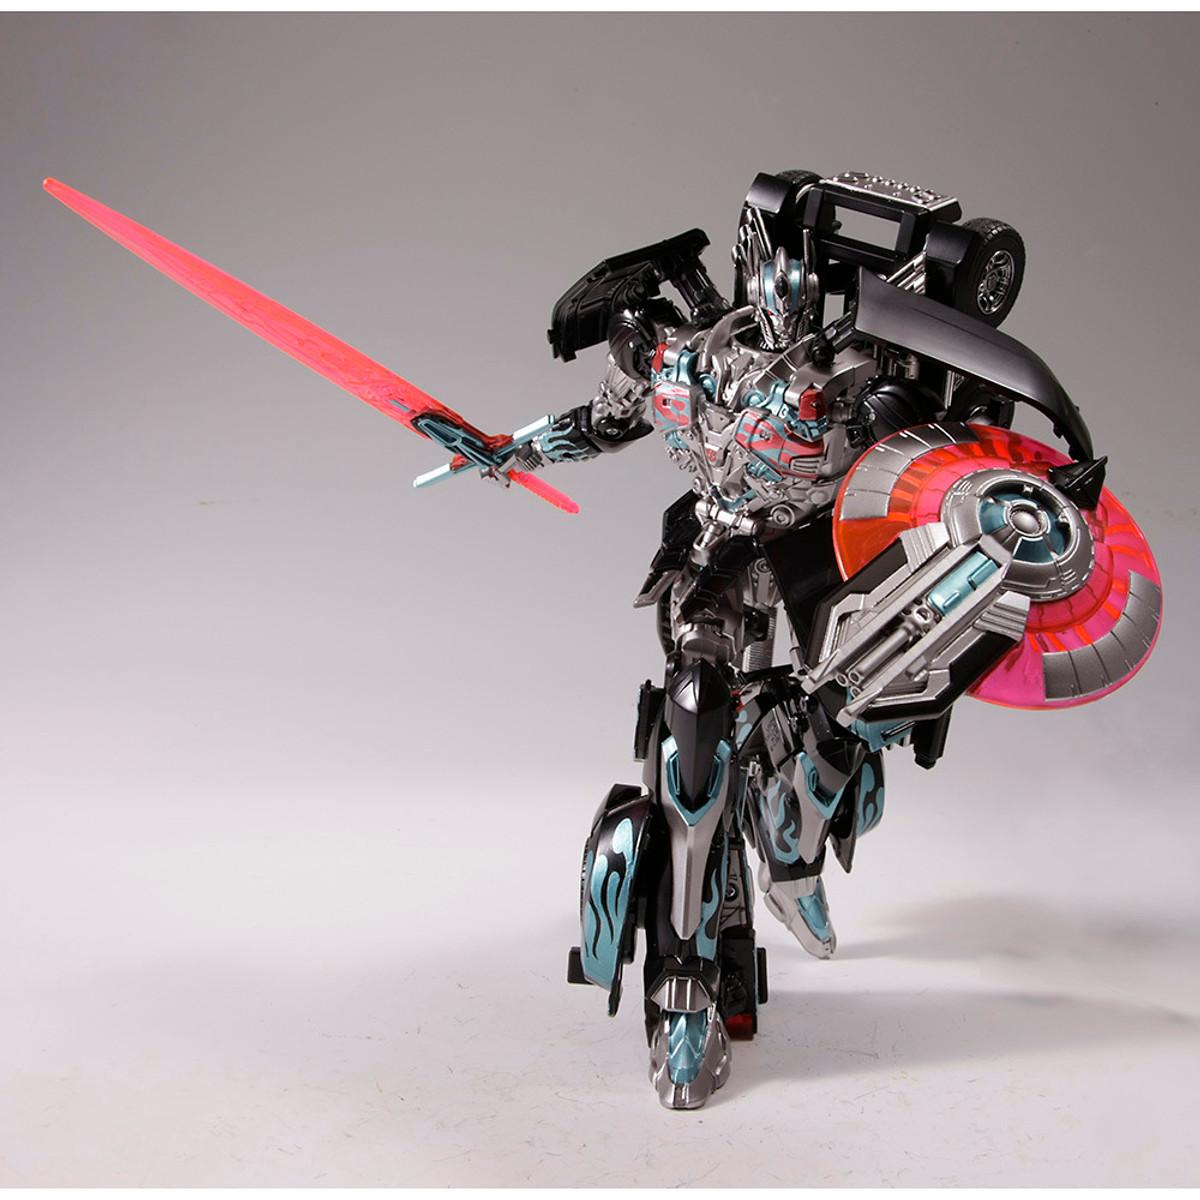 Transformers Movie Advanced series Black Knight Optimus Prime Action Figure